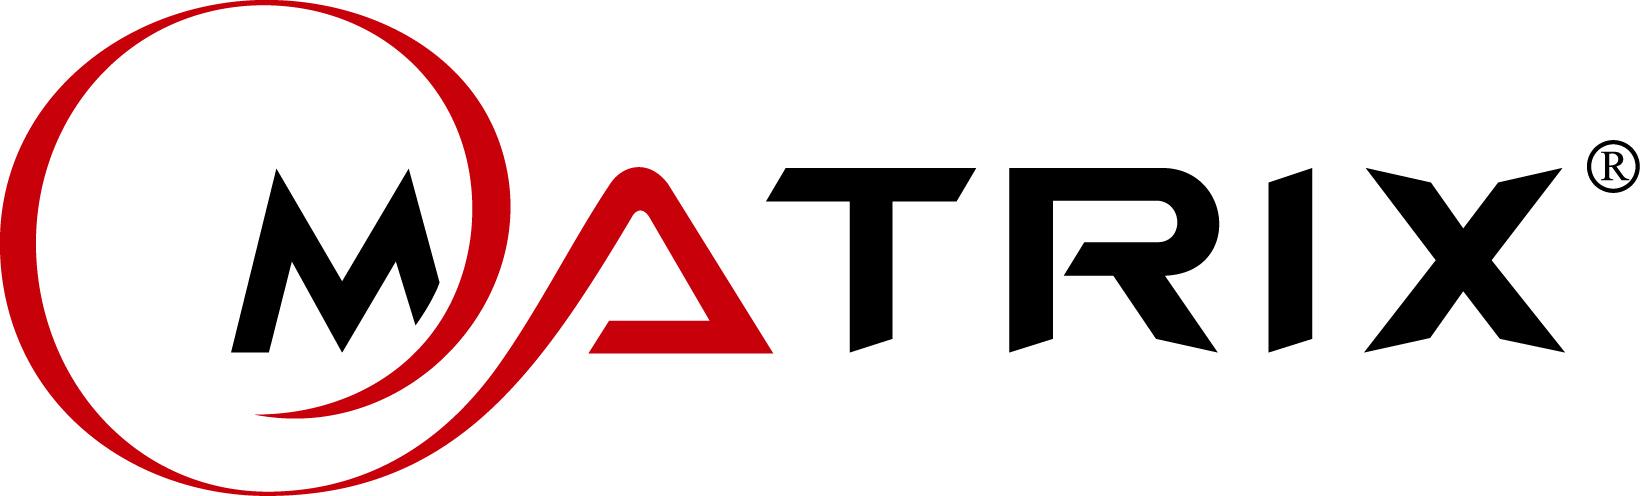 Shenzhen Matrix Battery Co.,Ltd.